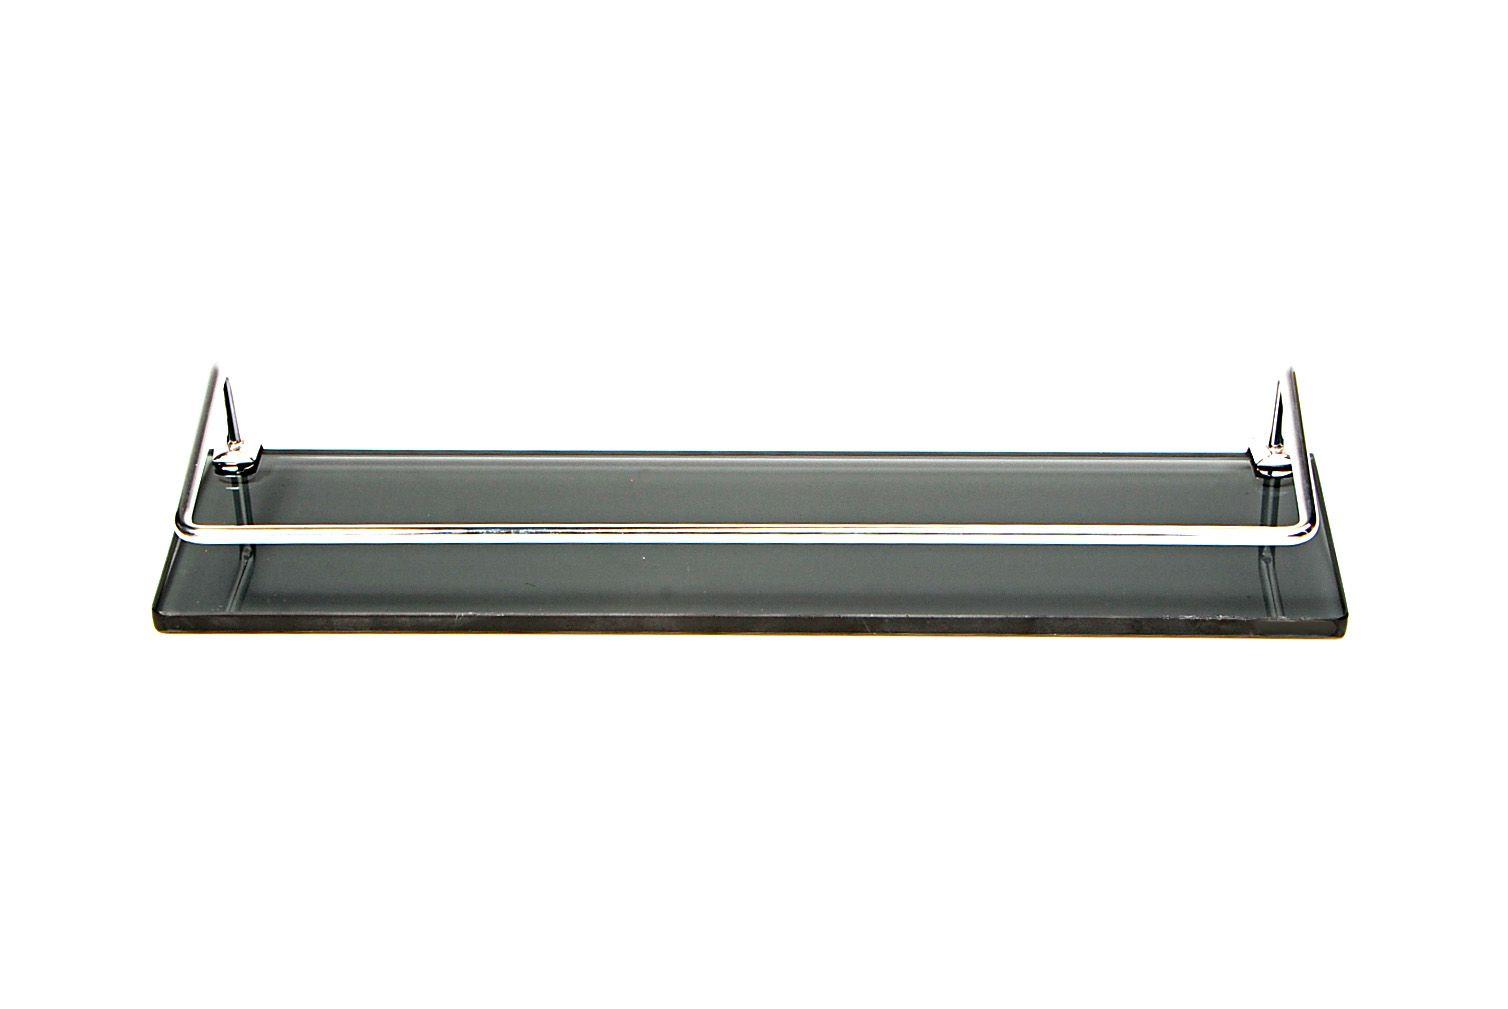 Porta Shampoo Reto em Vidro Fumê Lapidado - Aquabox  - 40cmx9cmx10mm